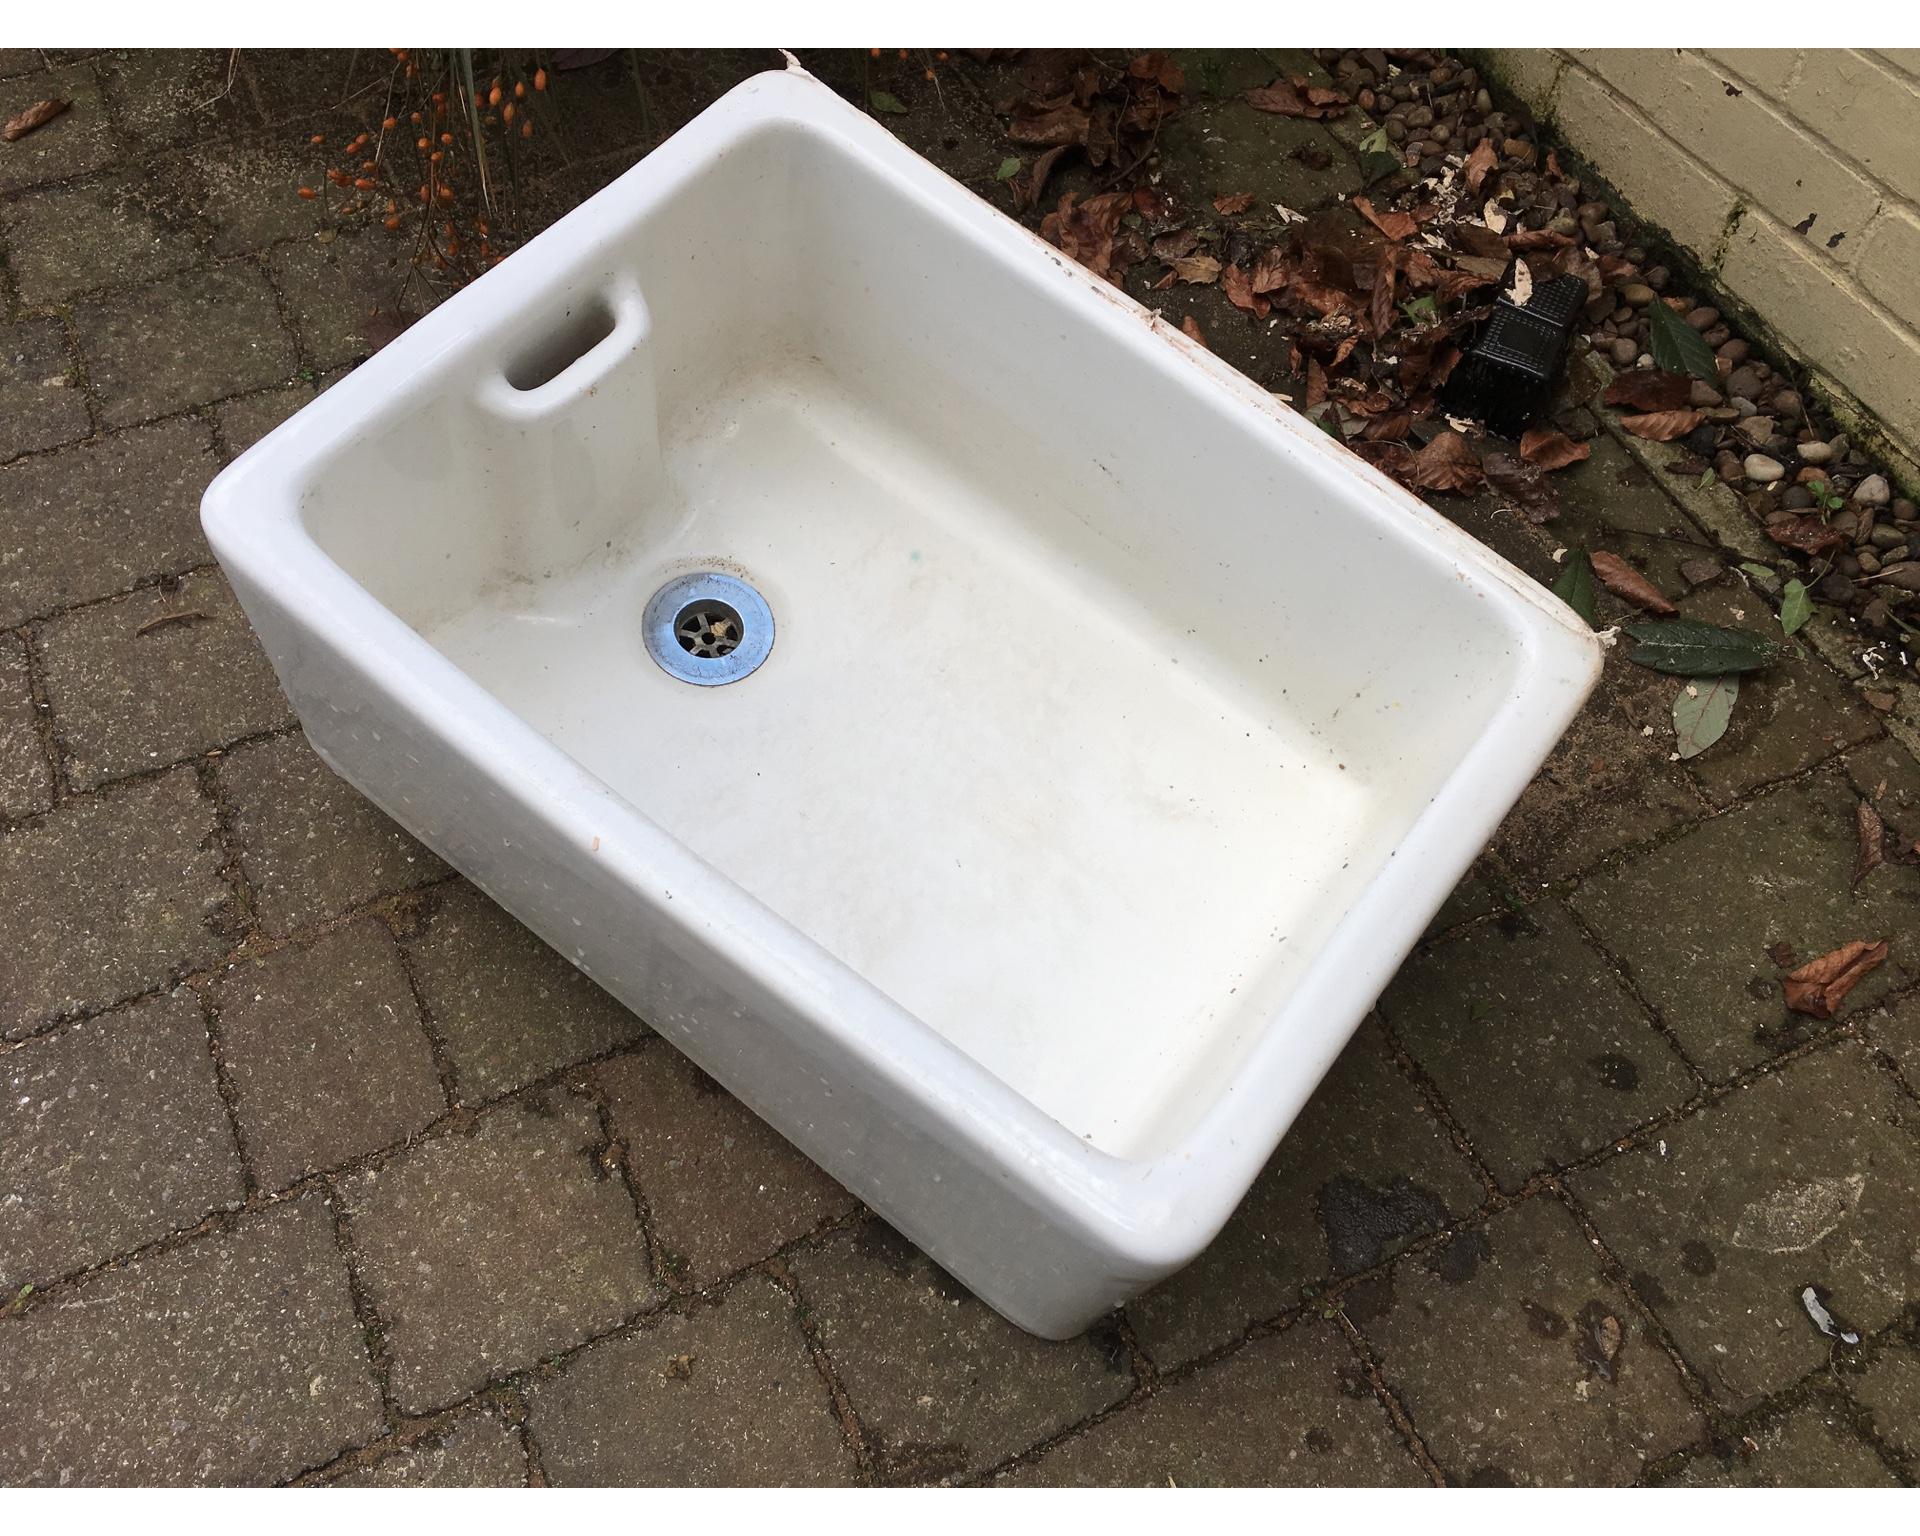 Royal Doulton Belfast Sink EBay